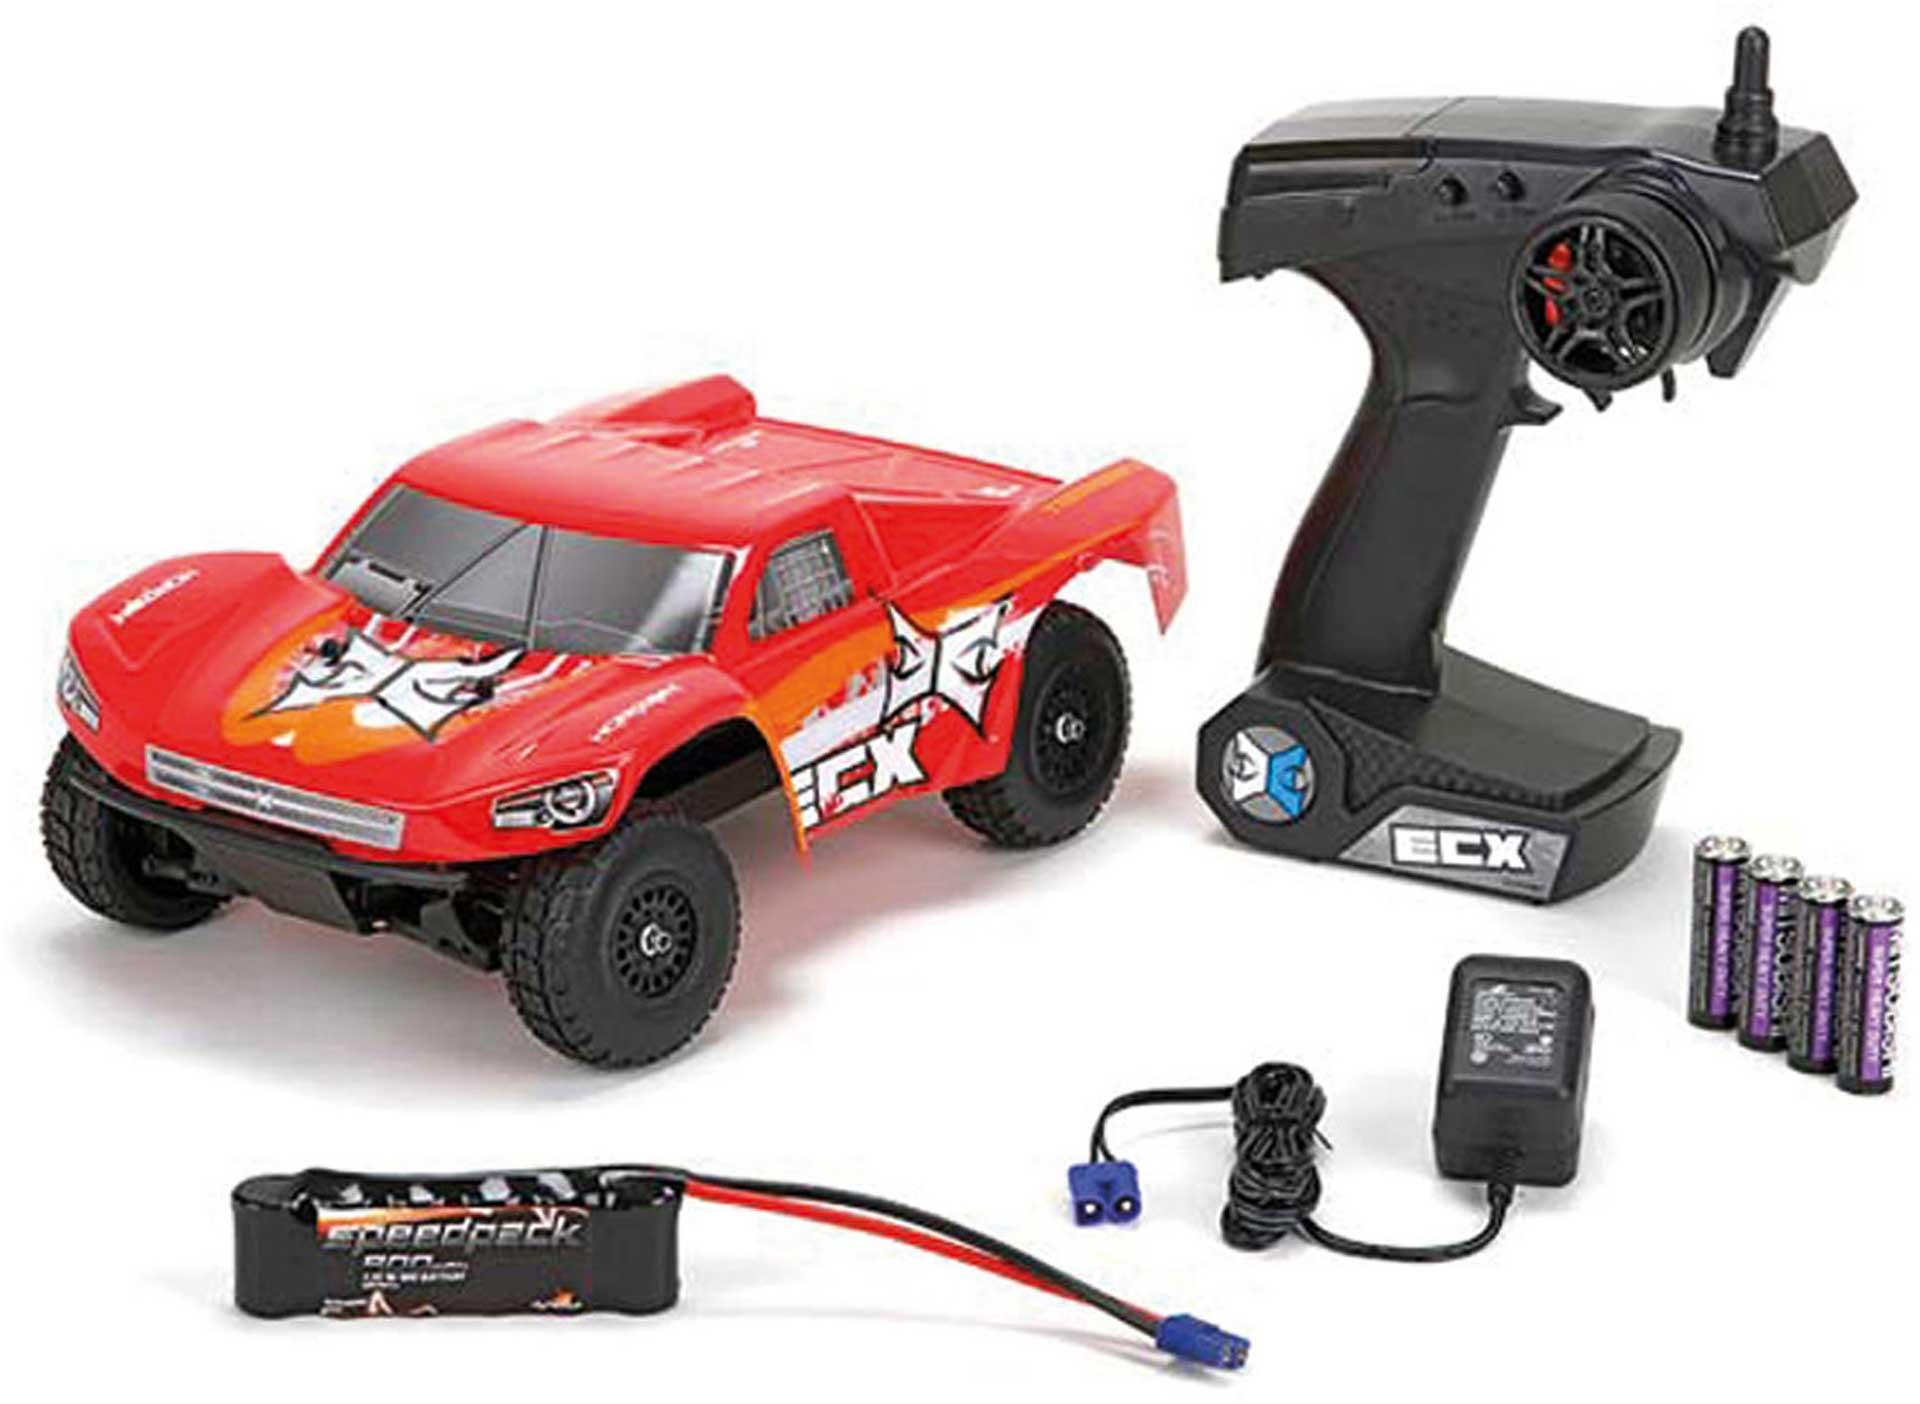 ECX TORMENT 1/18 4WD SHORT COURSE TRUCK ROT ORANGE RTR